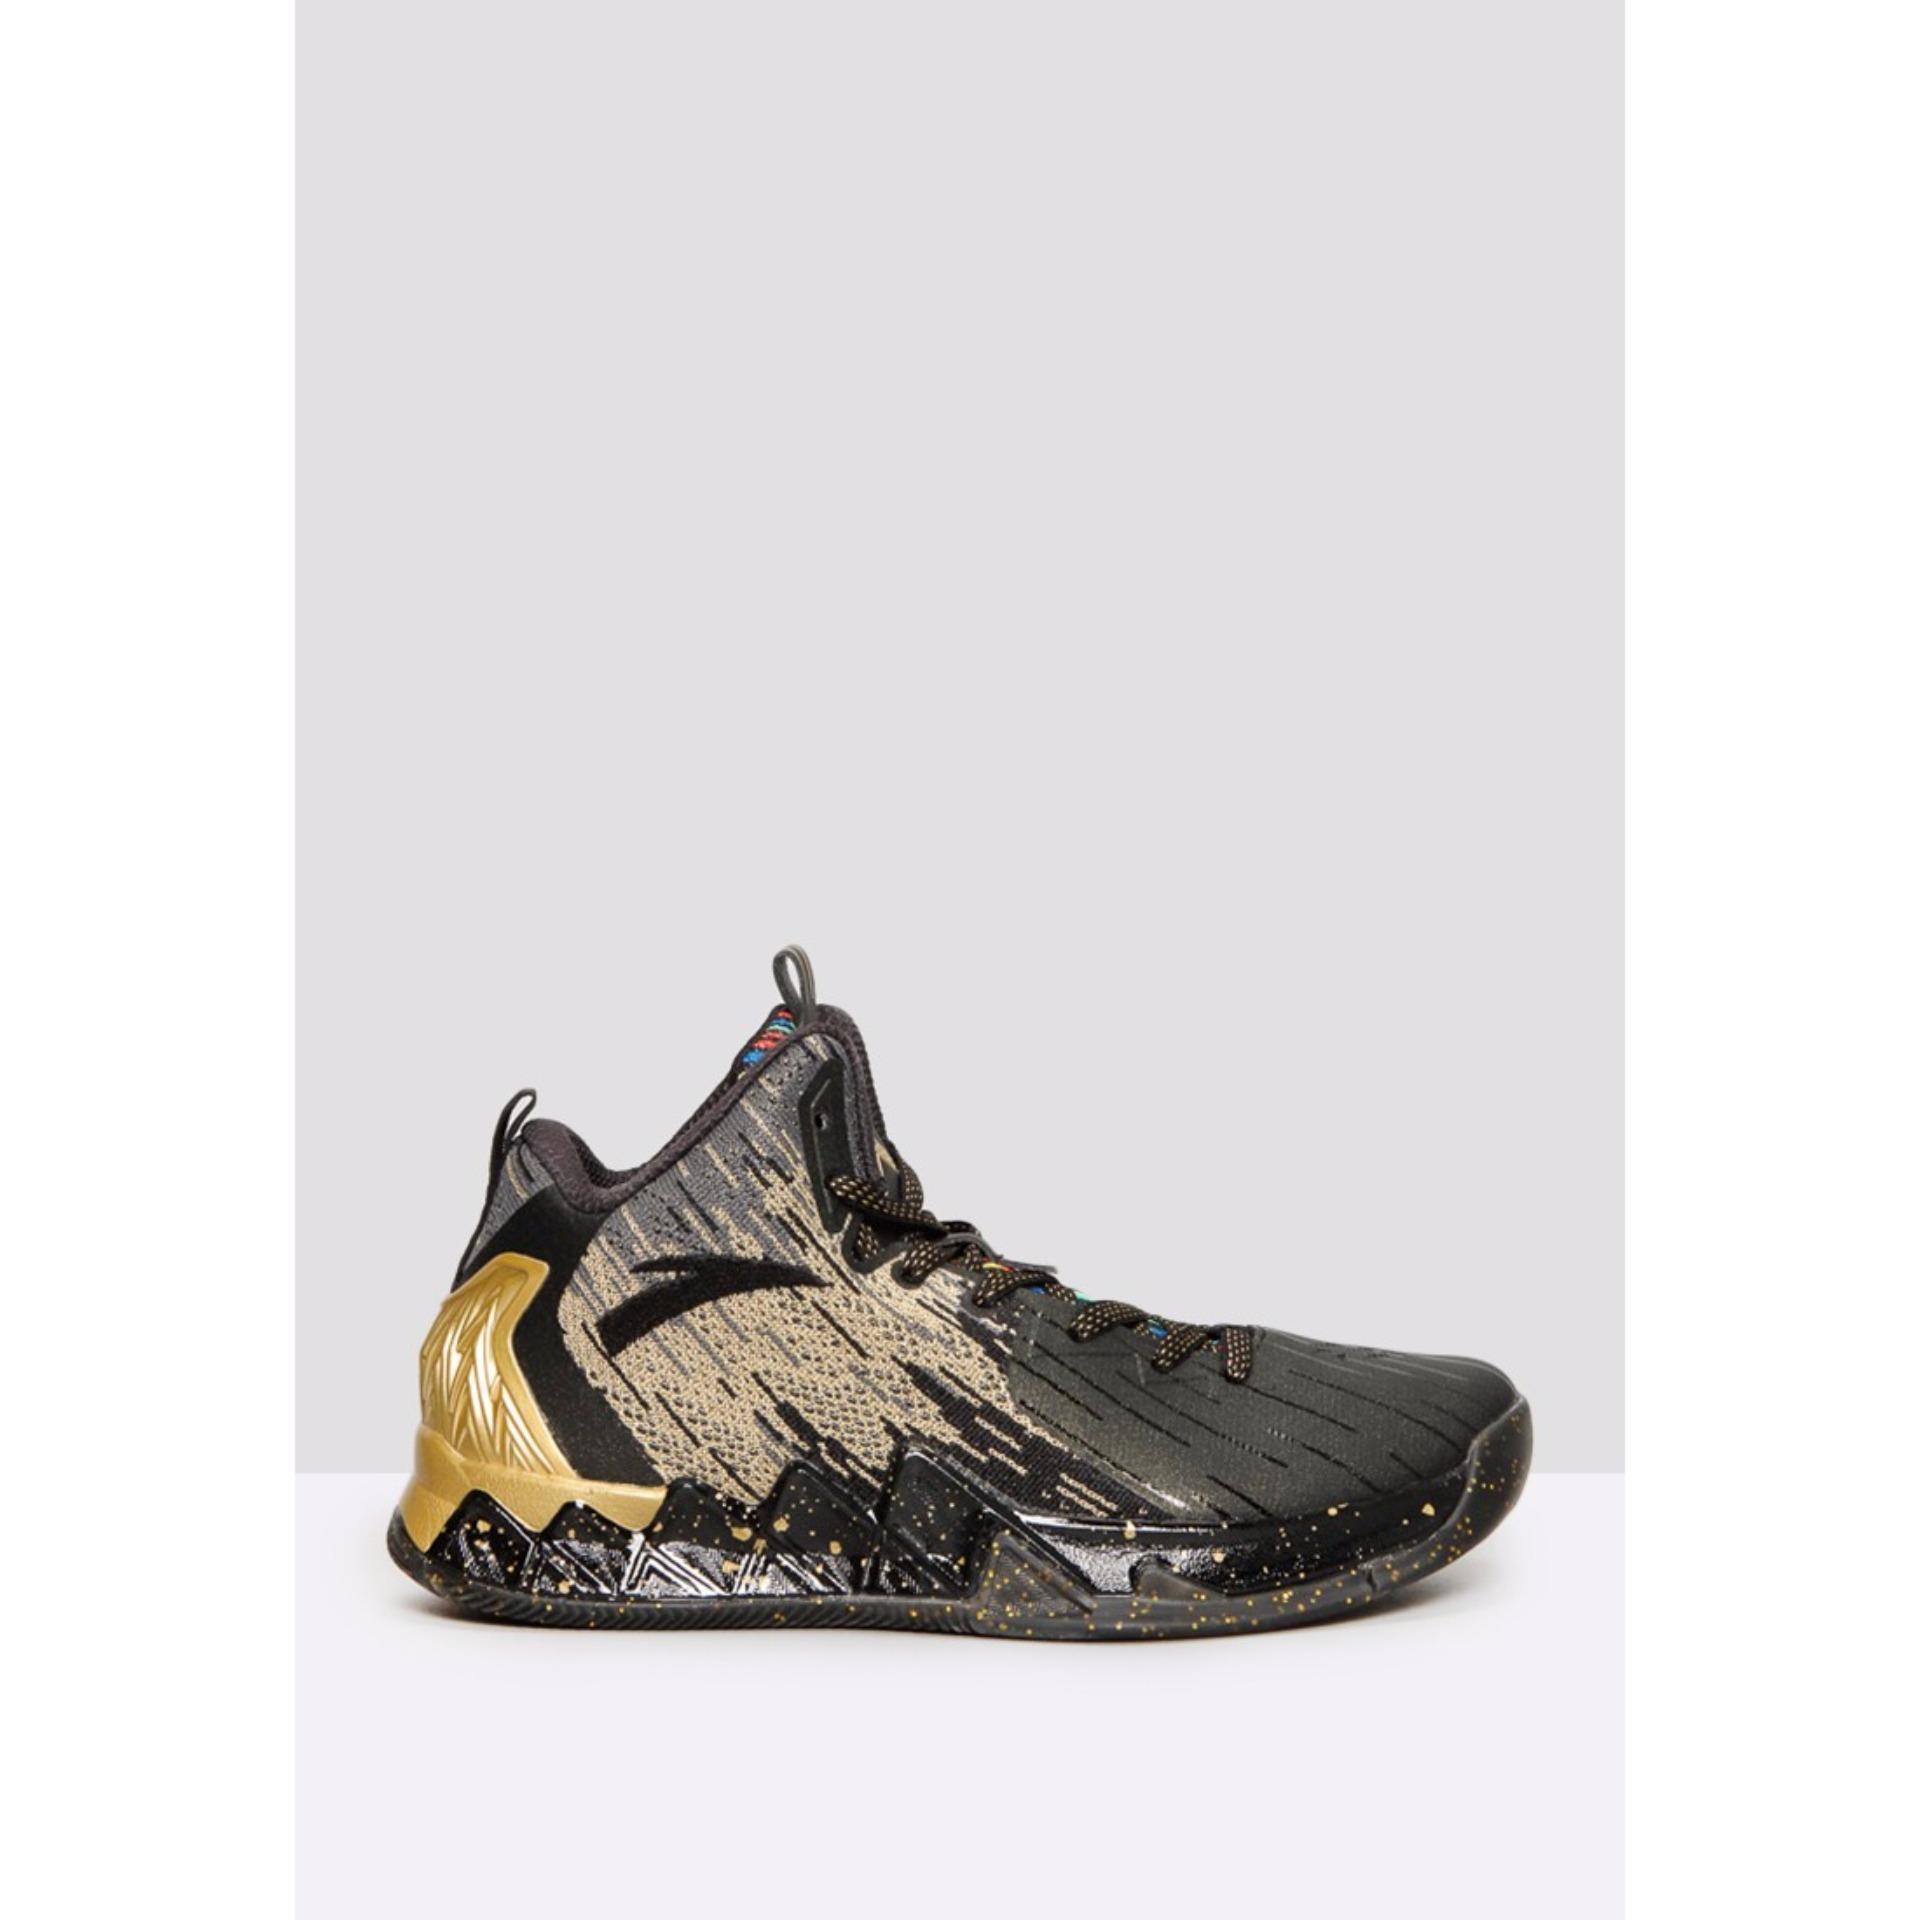 Giày bóng rổ nam Anta 81731101-4 màu đen